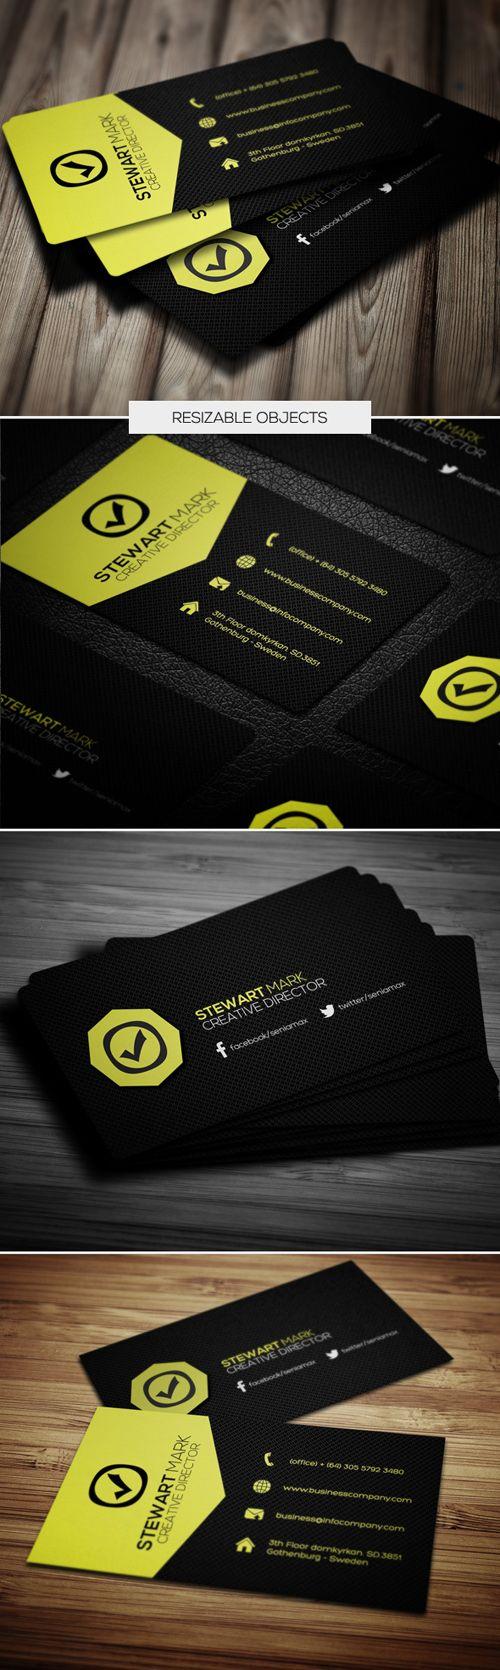 Creative Corporate Business Card #businesscarddesign #businesscards #businesscardtemplate